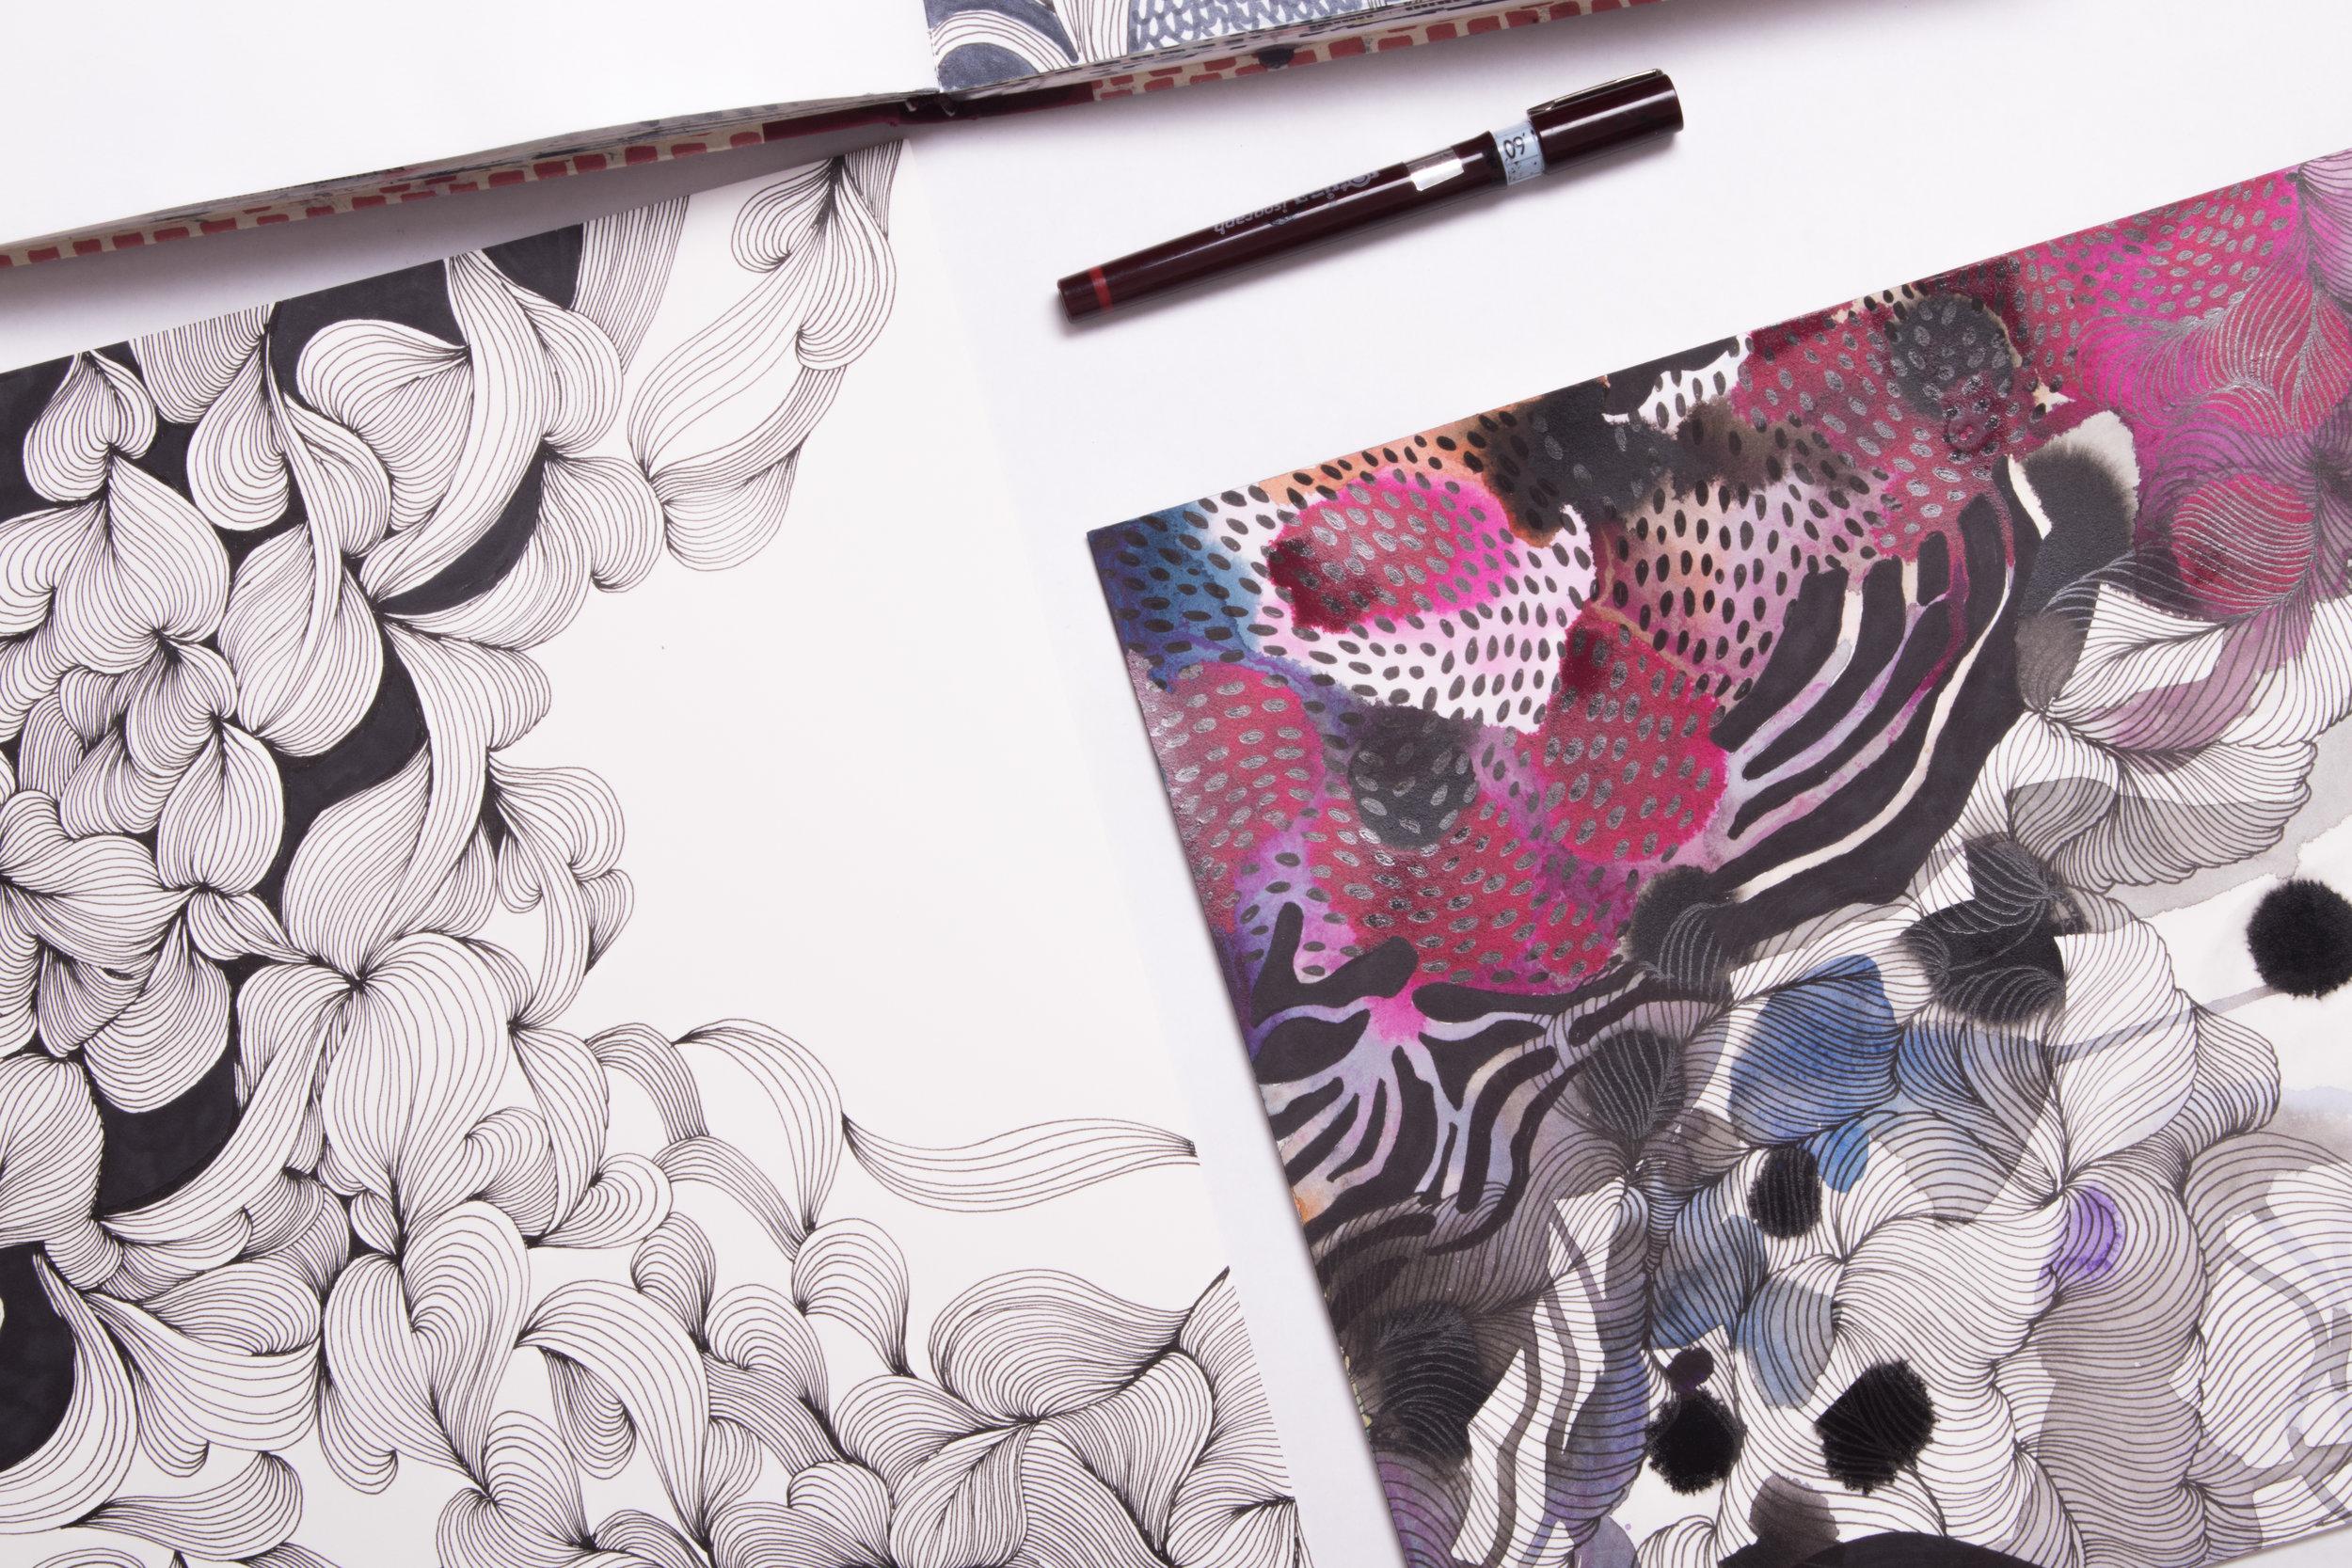 Artworks by Helen wells